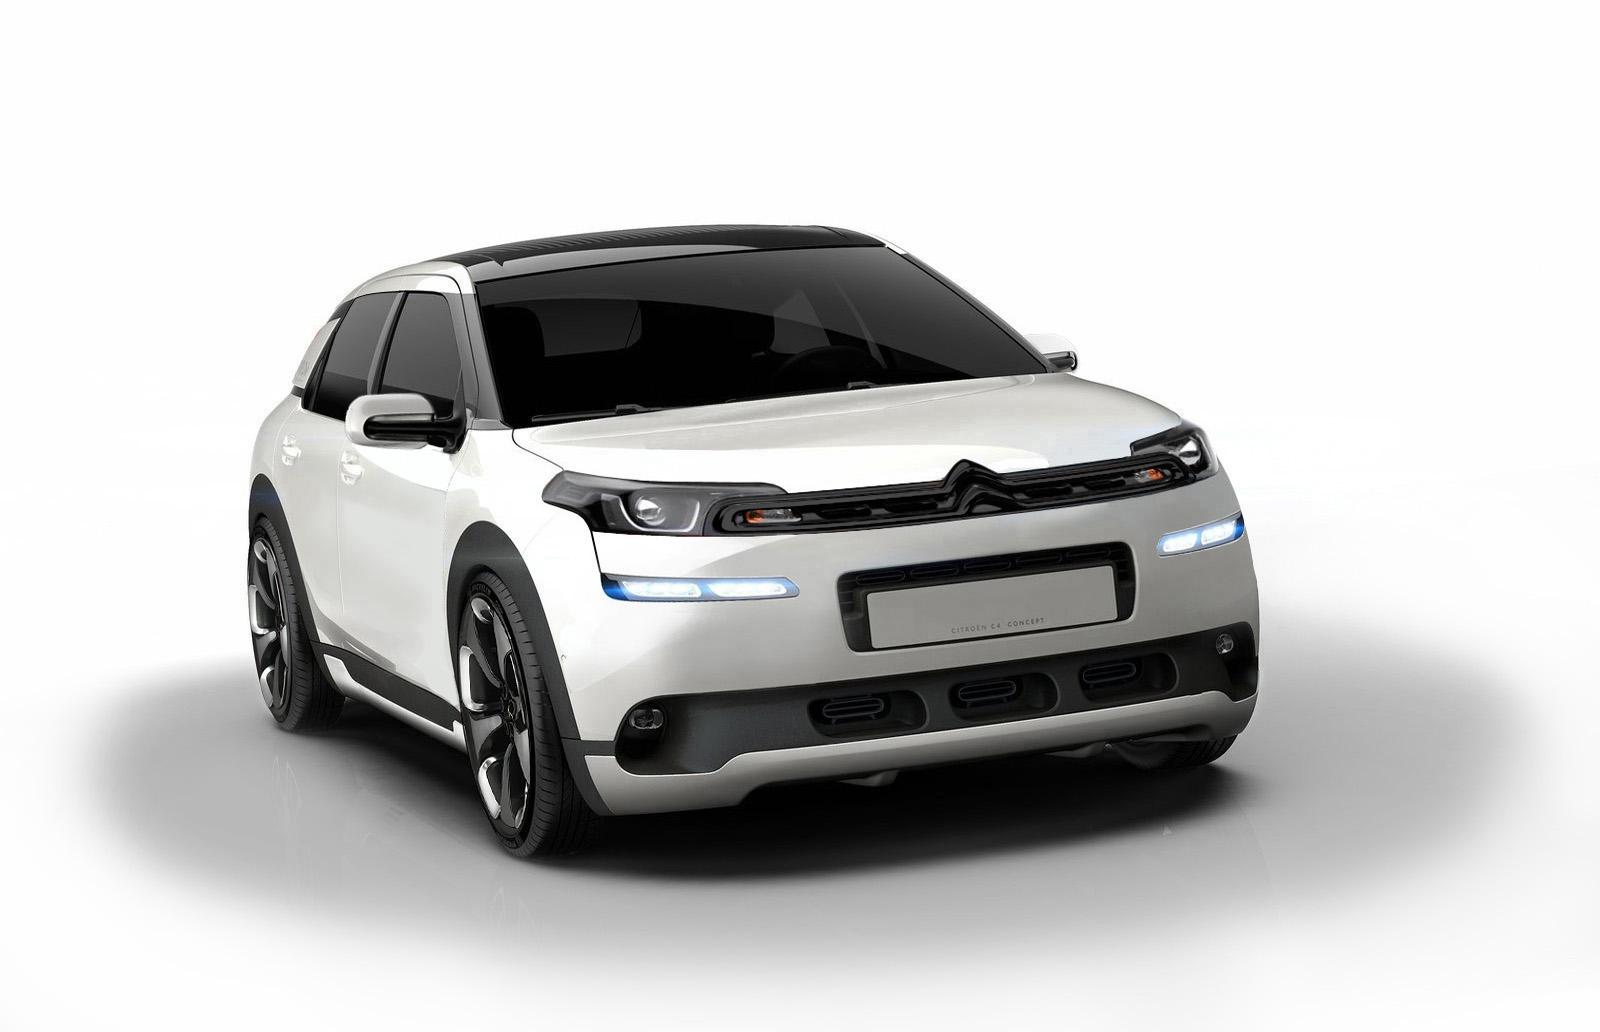 2017 - [FUTUR MODÈLE] Citroën C4 III [F3] - Page 4 Citroe16